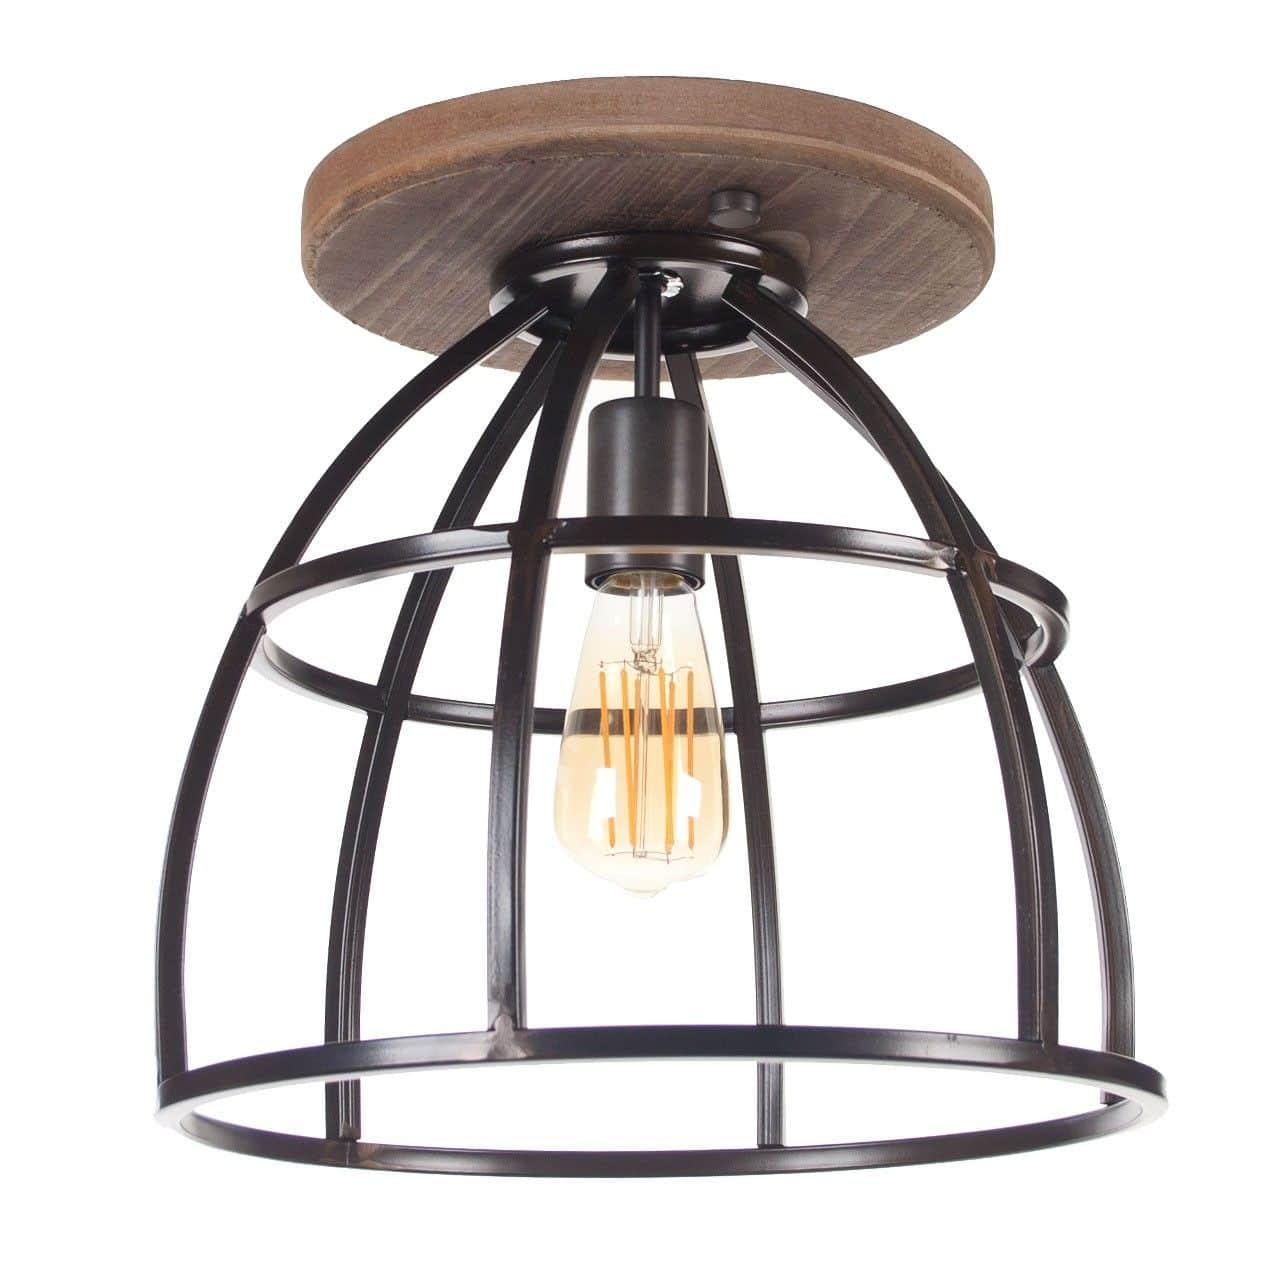 Plafondlamp Birdie Groot Zwart Staal Hout